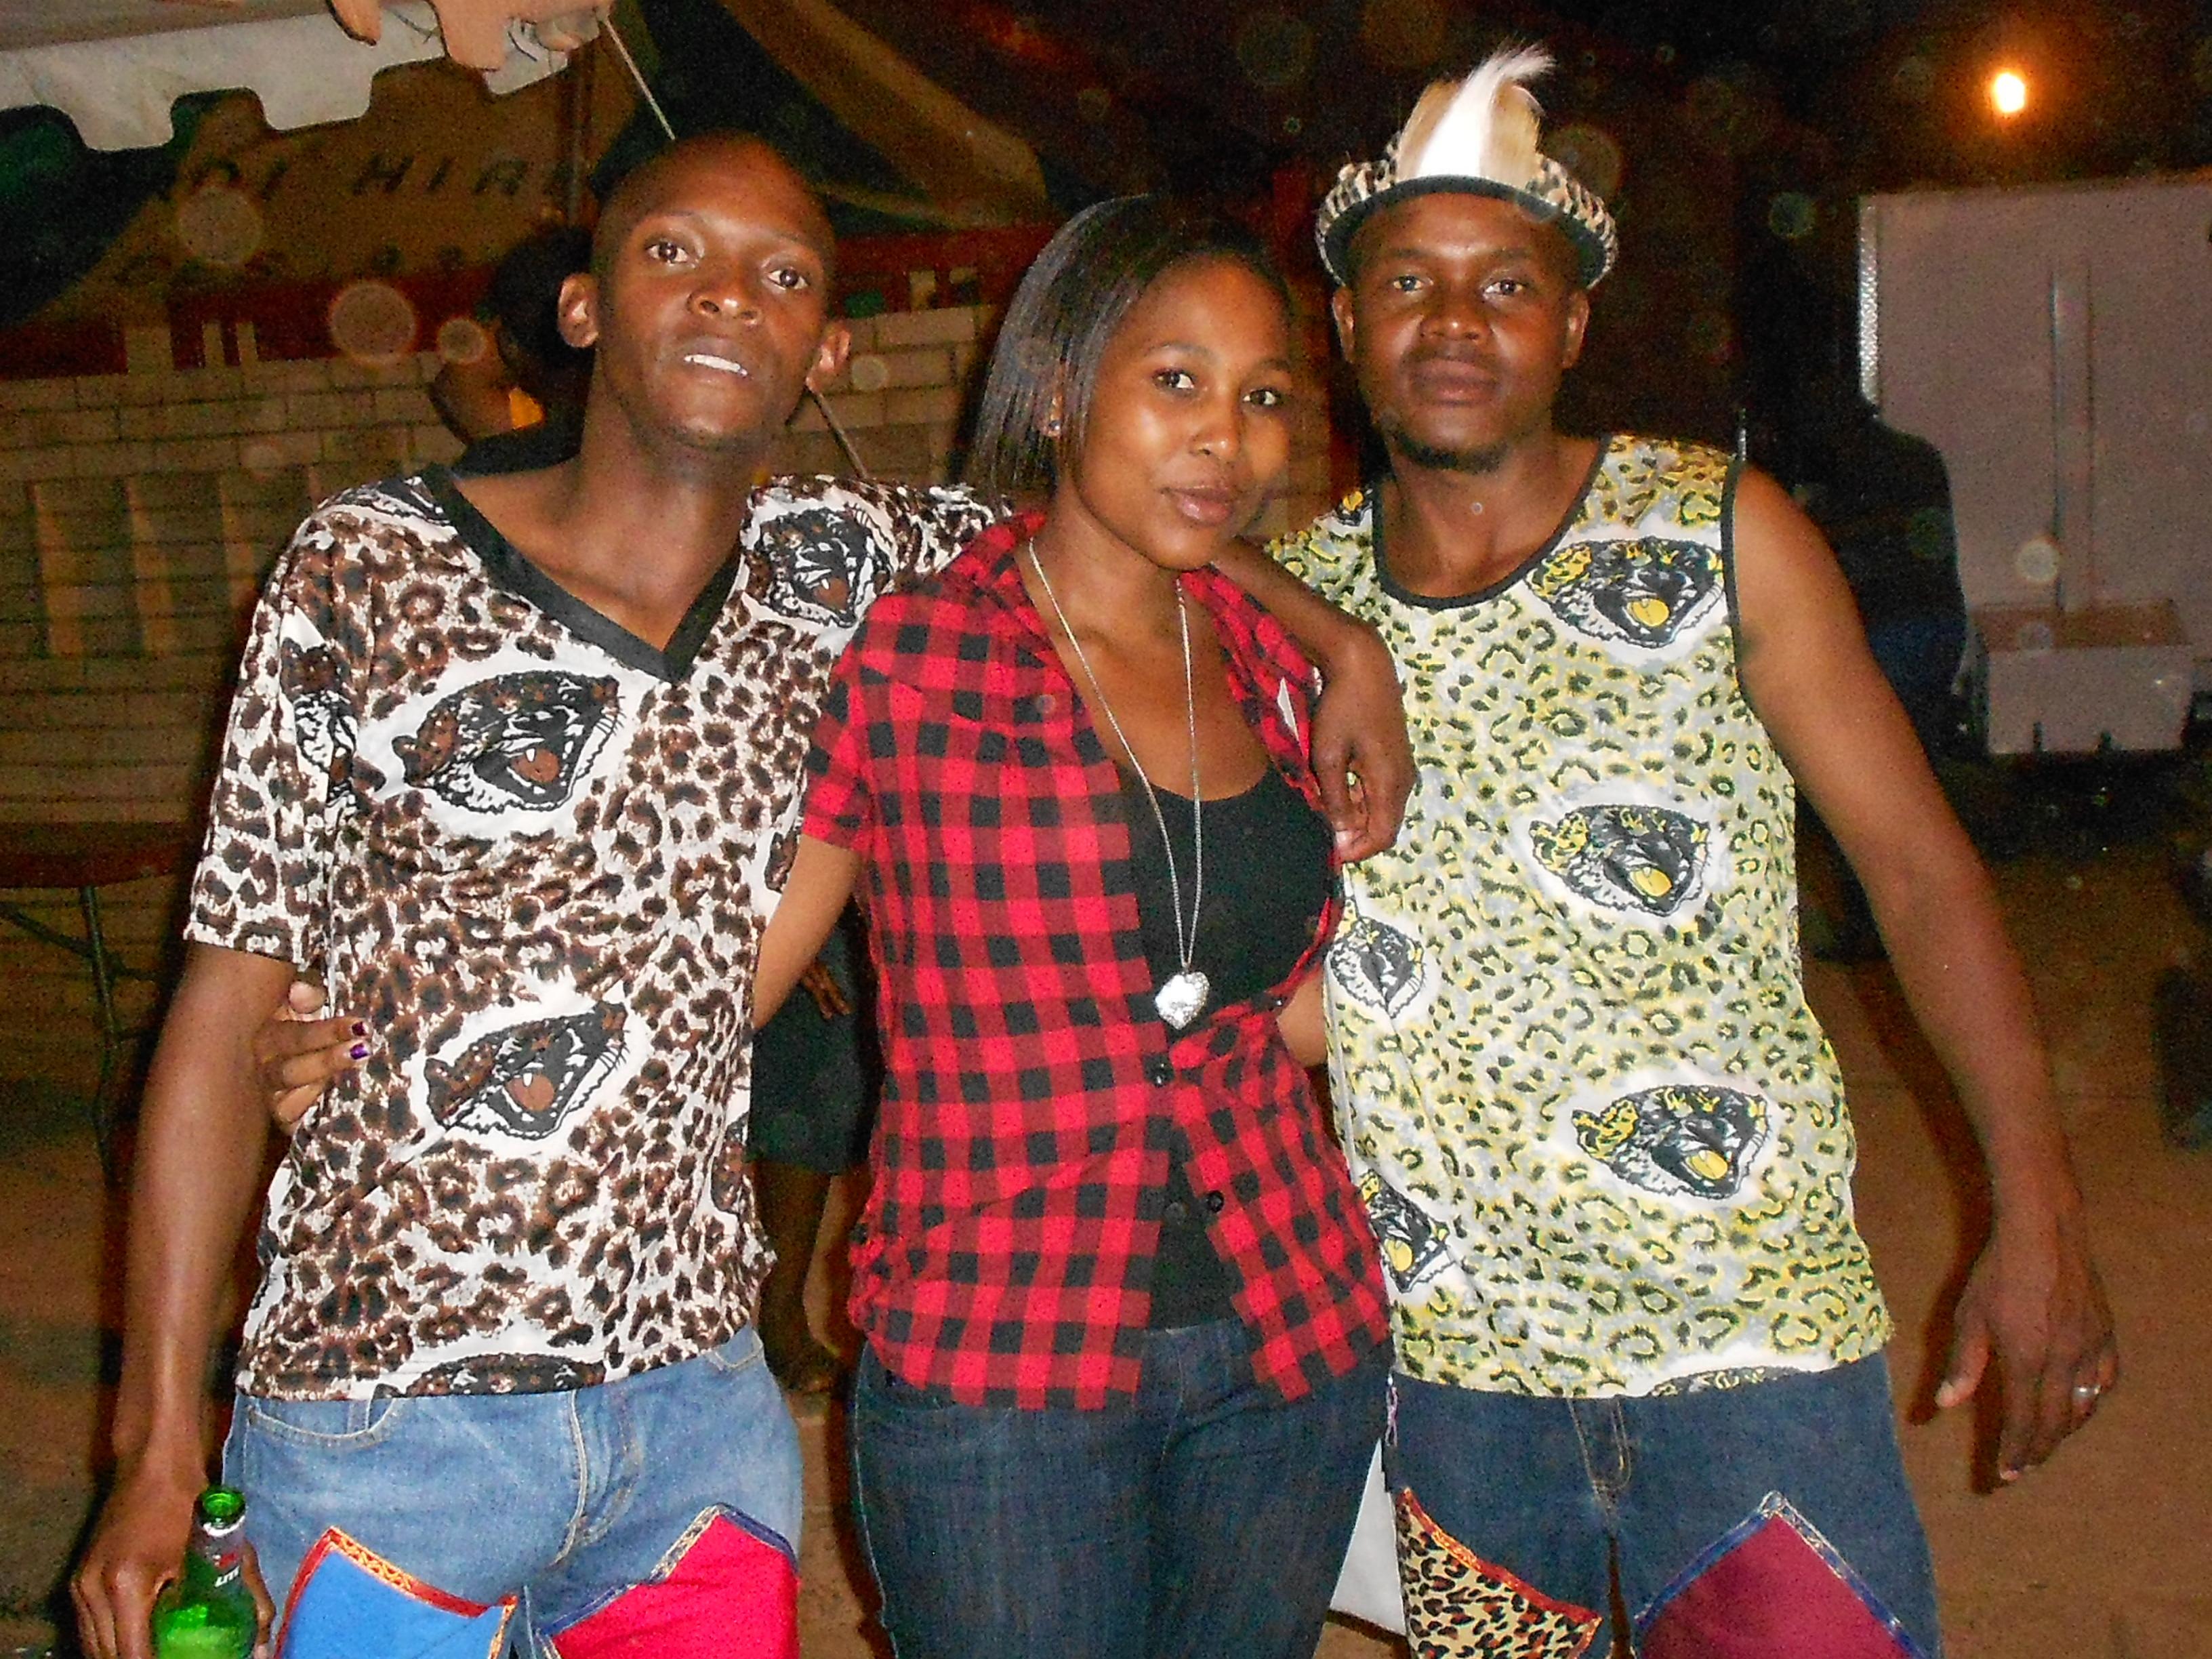 Rscn Zulu Man And Xhosa Woman